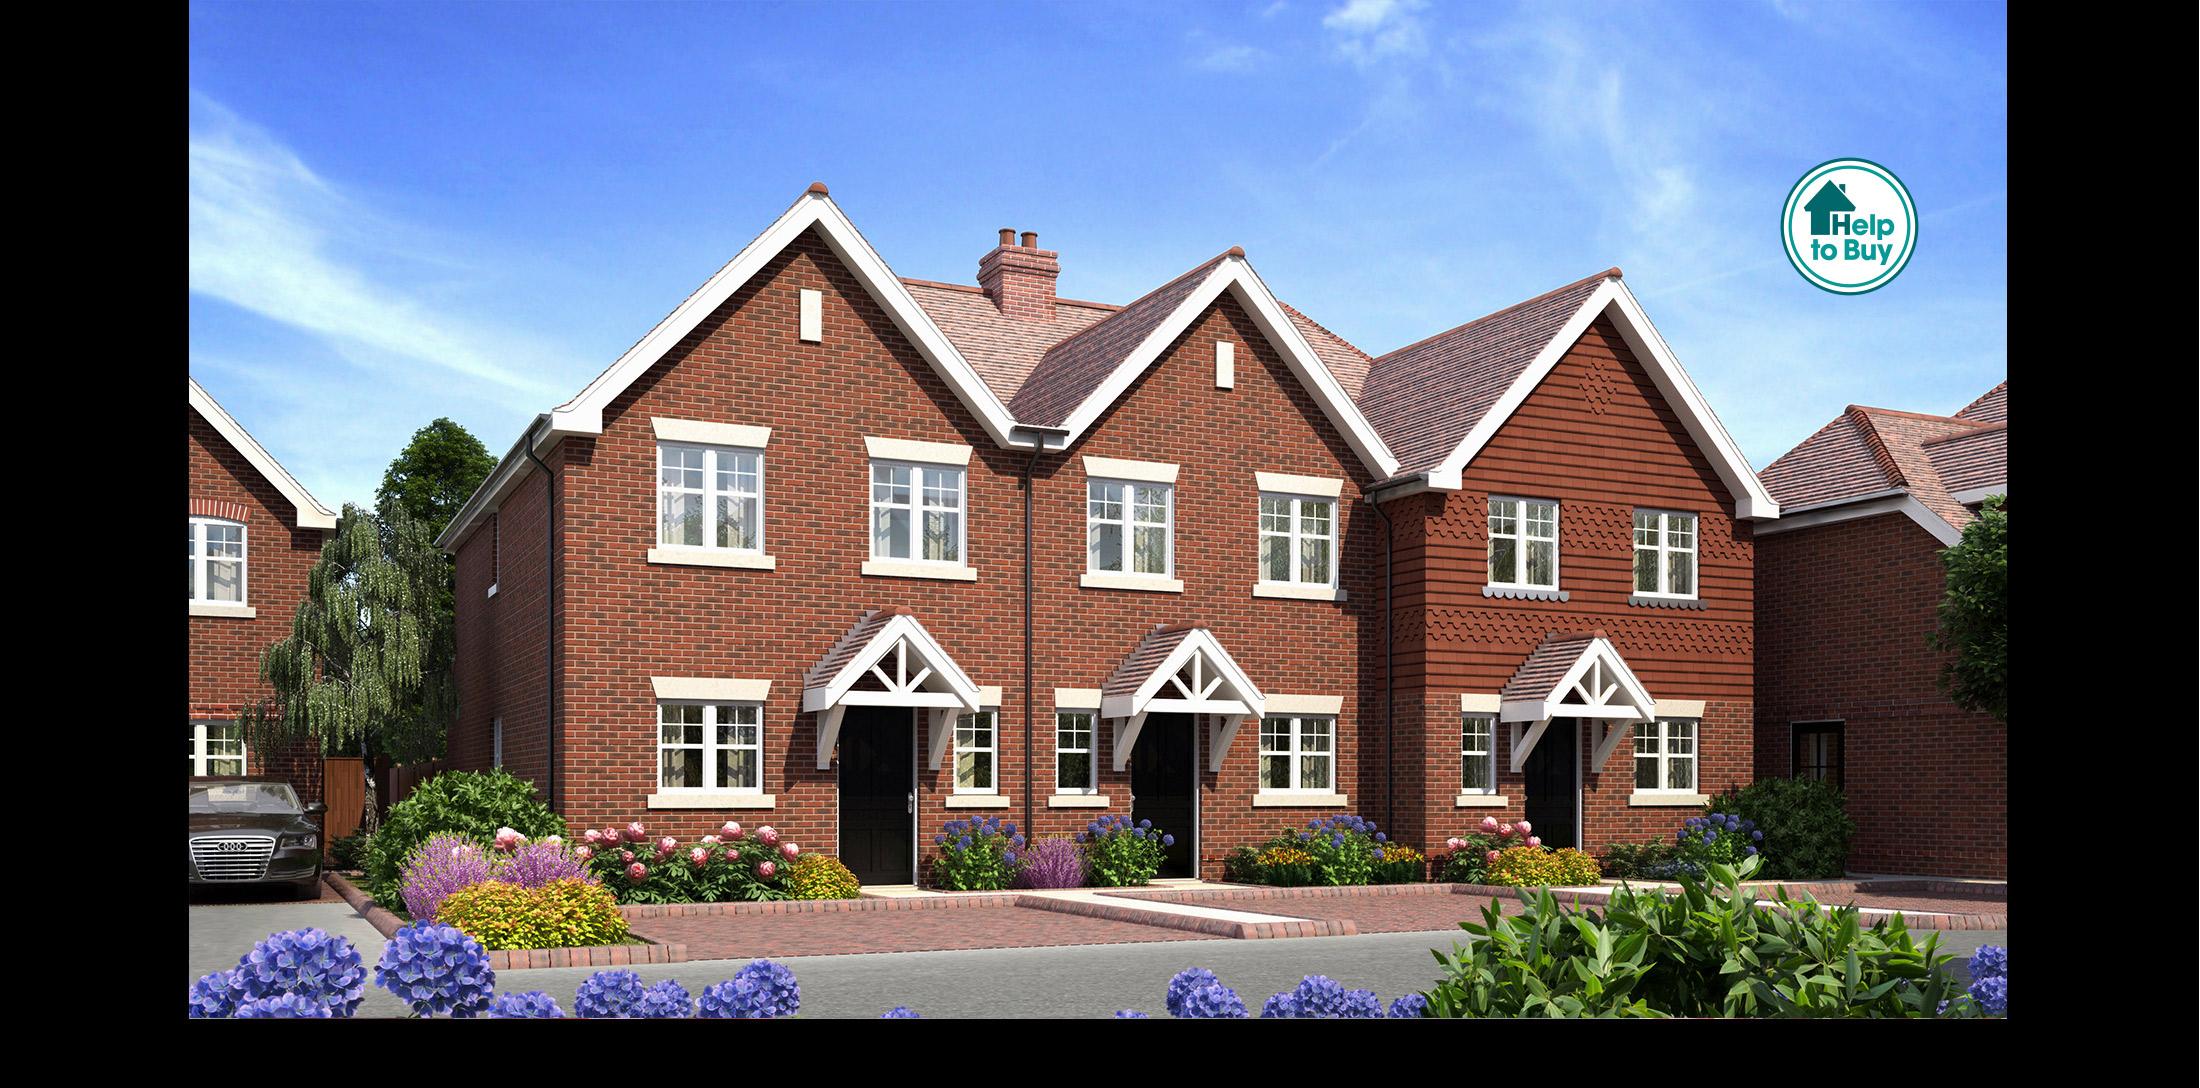 concept-developments-alder-grove-new-homes-chilworth-surrey-cgi-1-htb